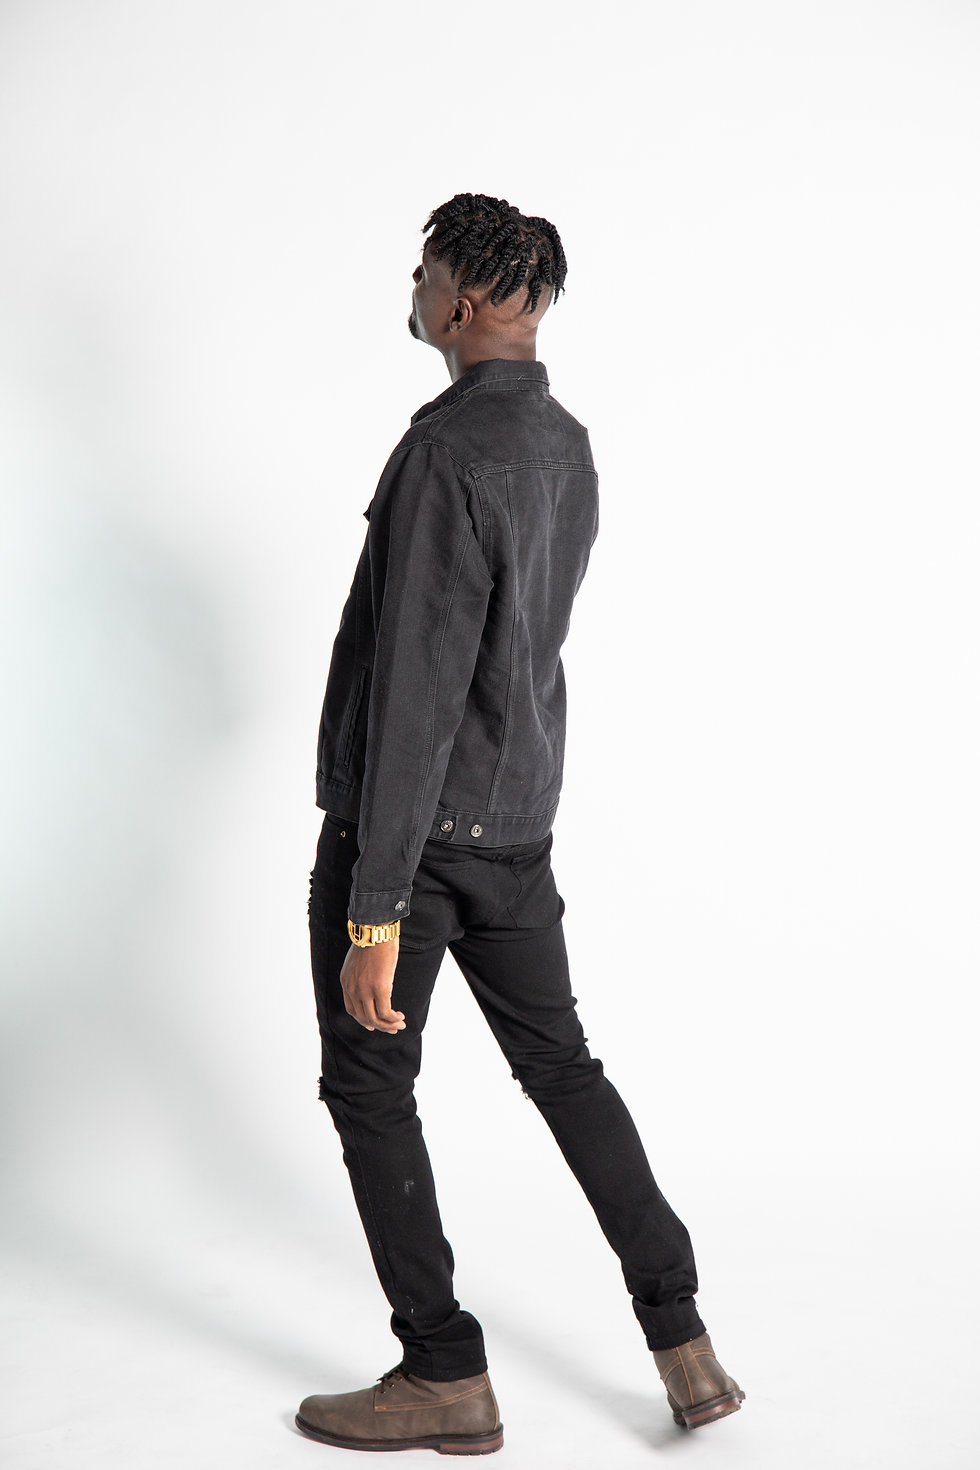 Drip Black outfit (turn back).jpg